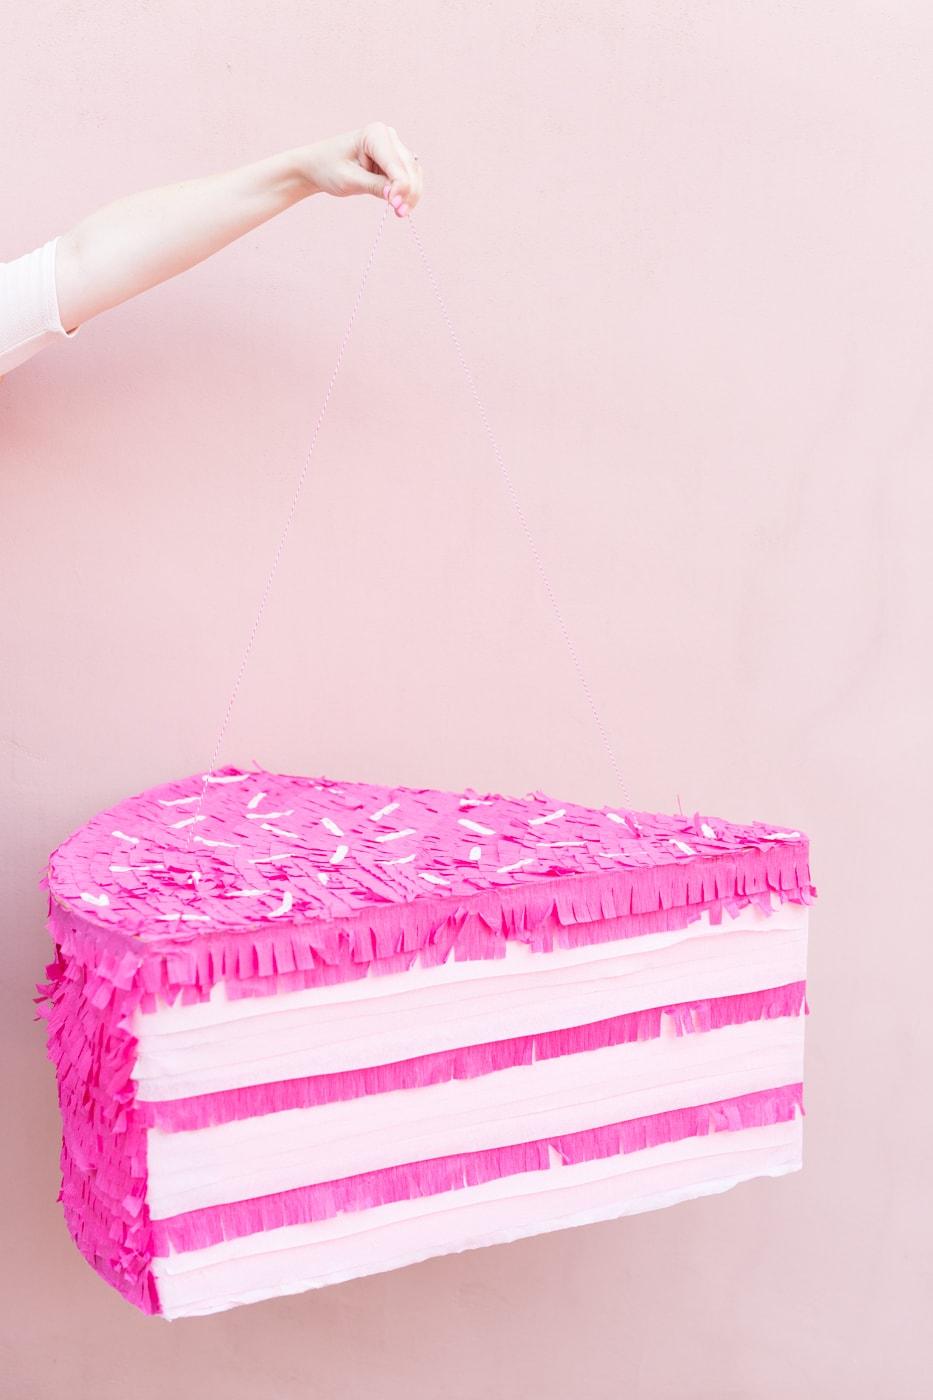 Prime Diy Giant Pink Birthday Cake Slice Pinata Best Friends For Frosting Funny Birthday Cards Online Alyptdamsfinfo